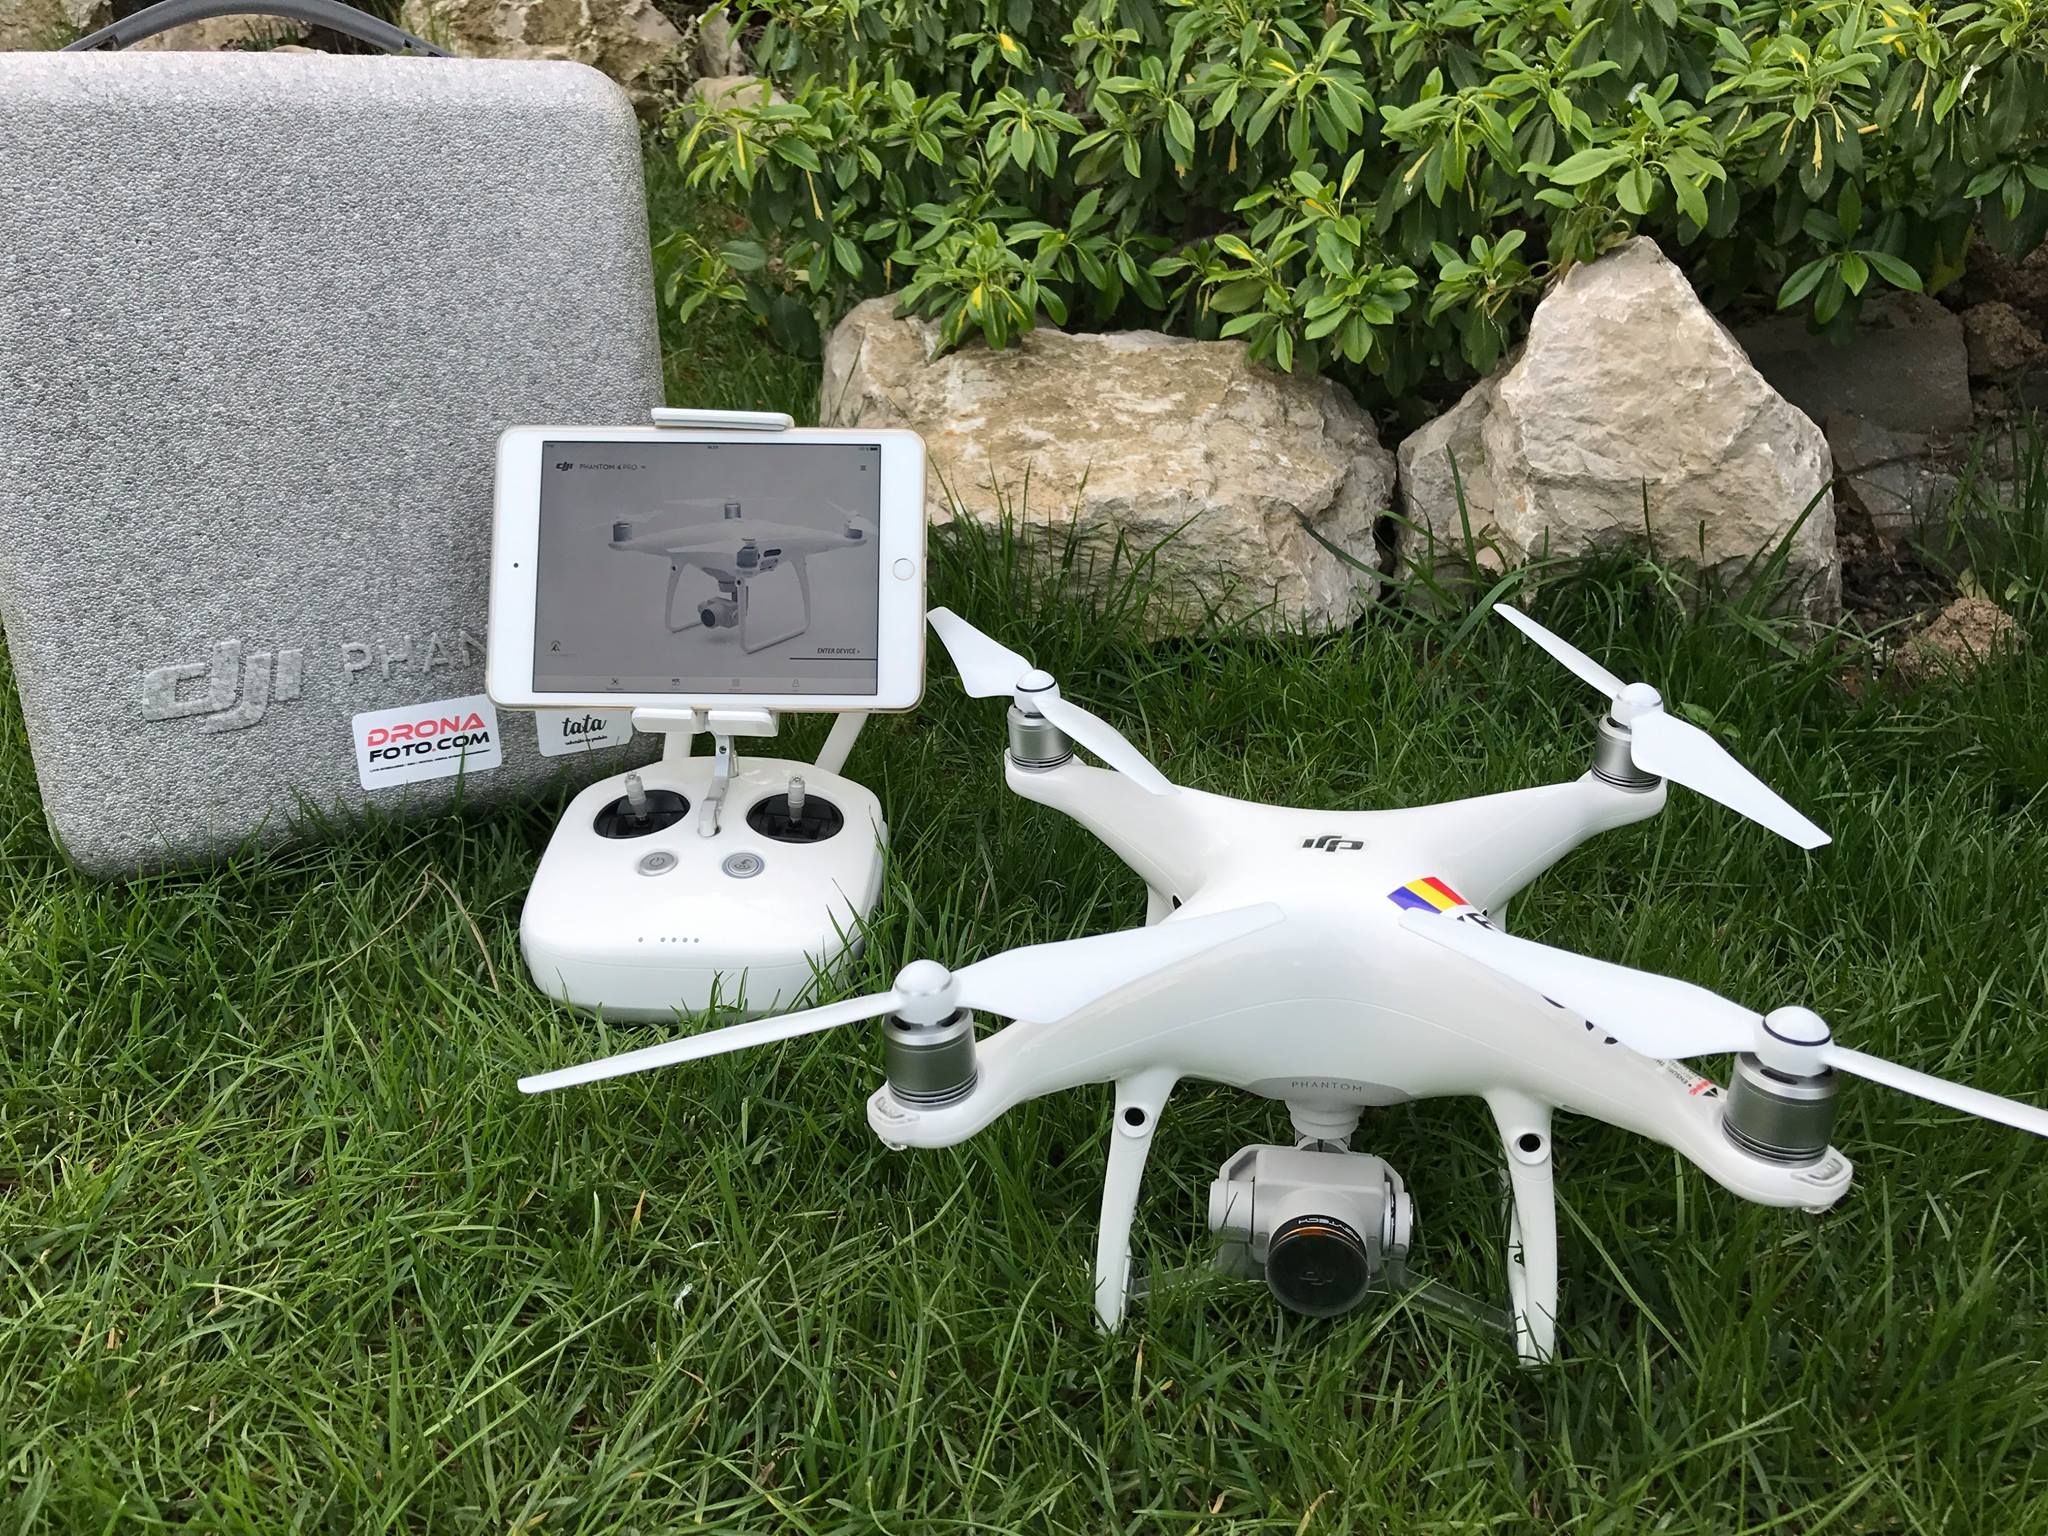 Închiriere_dronă_DJI_Phantom_4_PRO